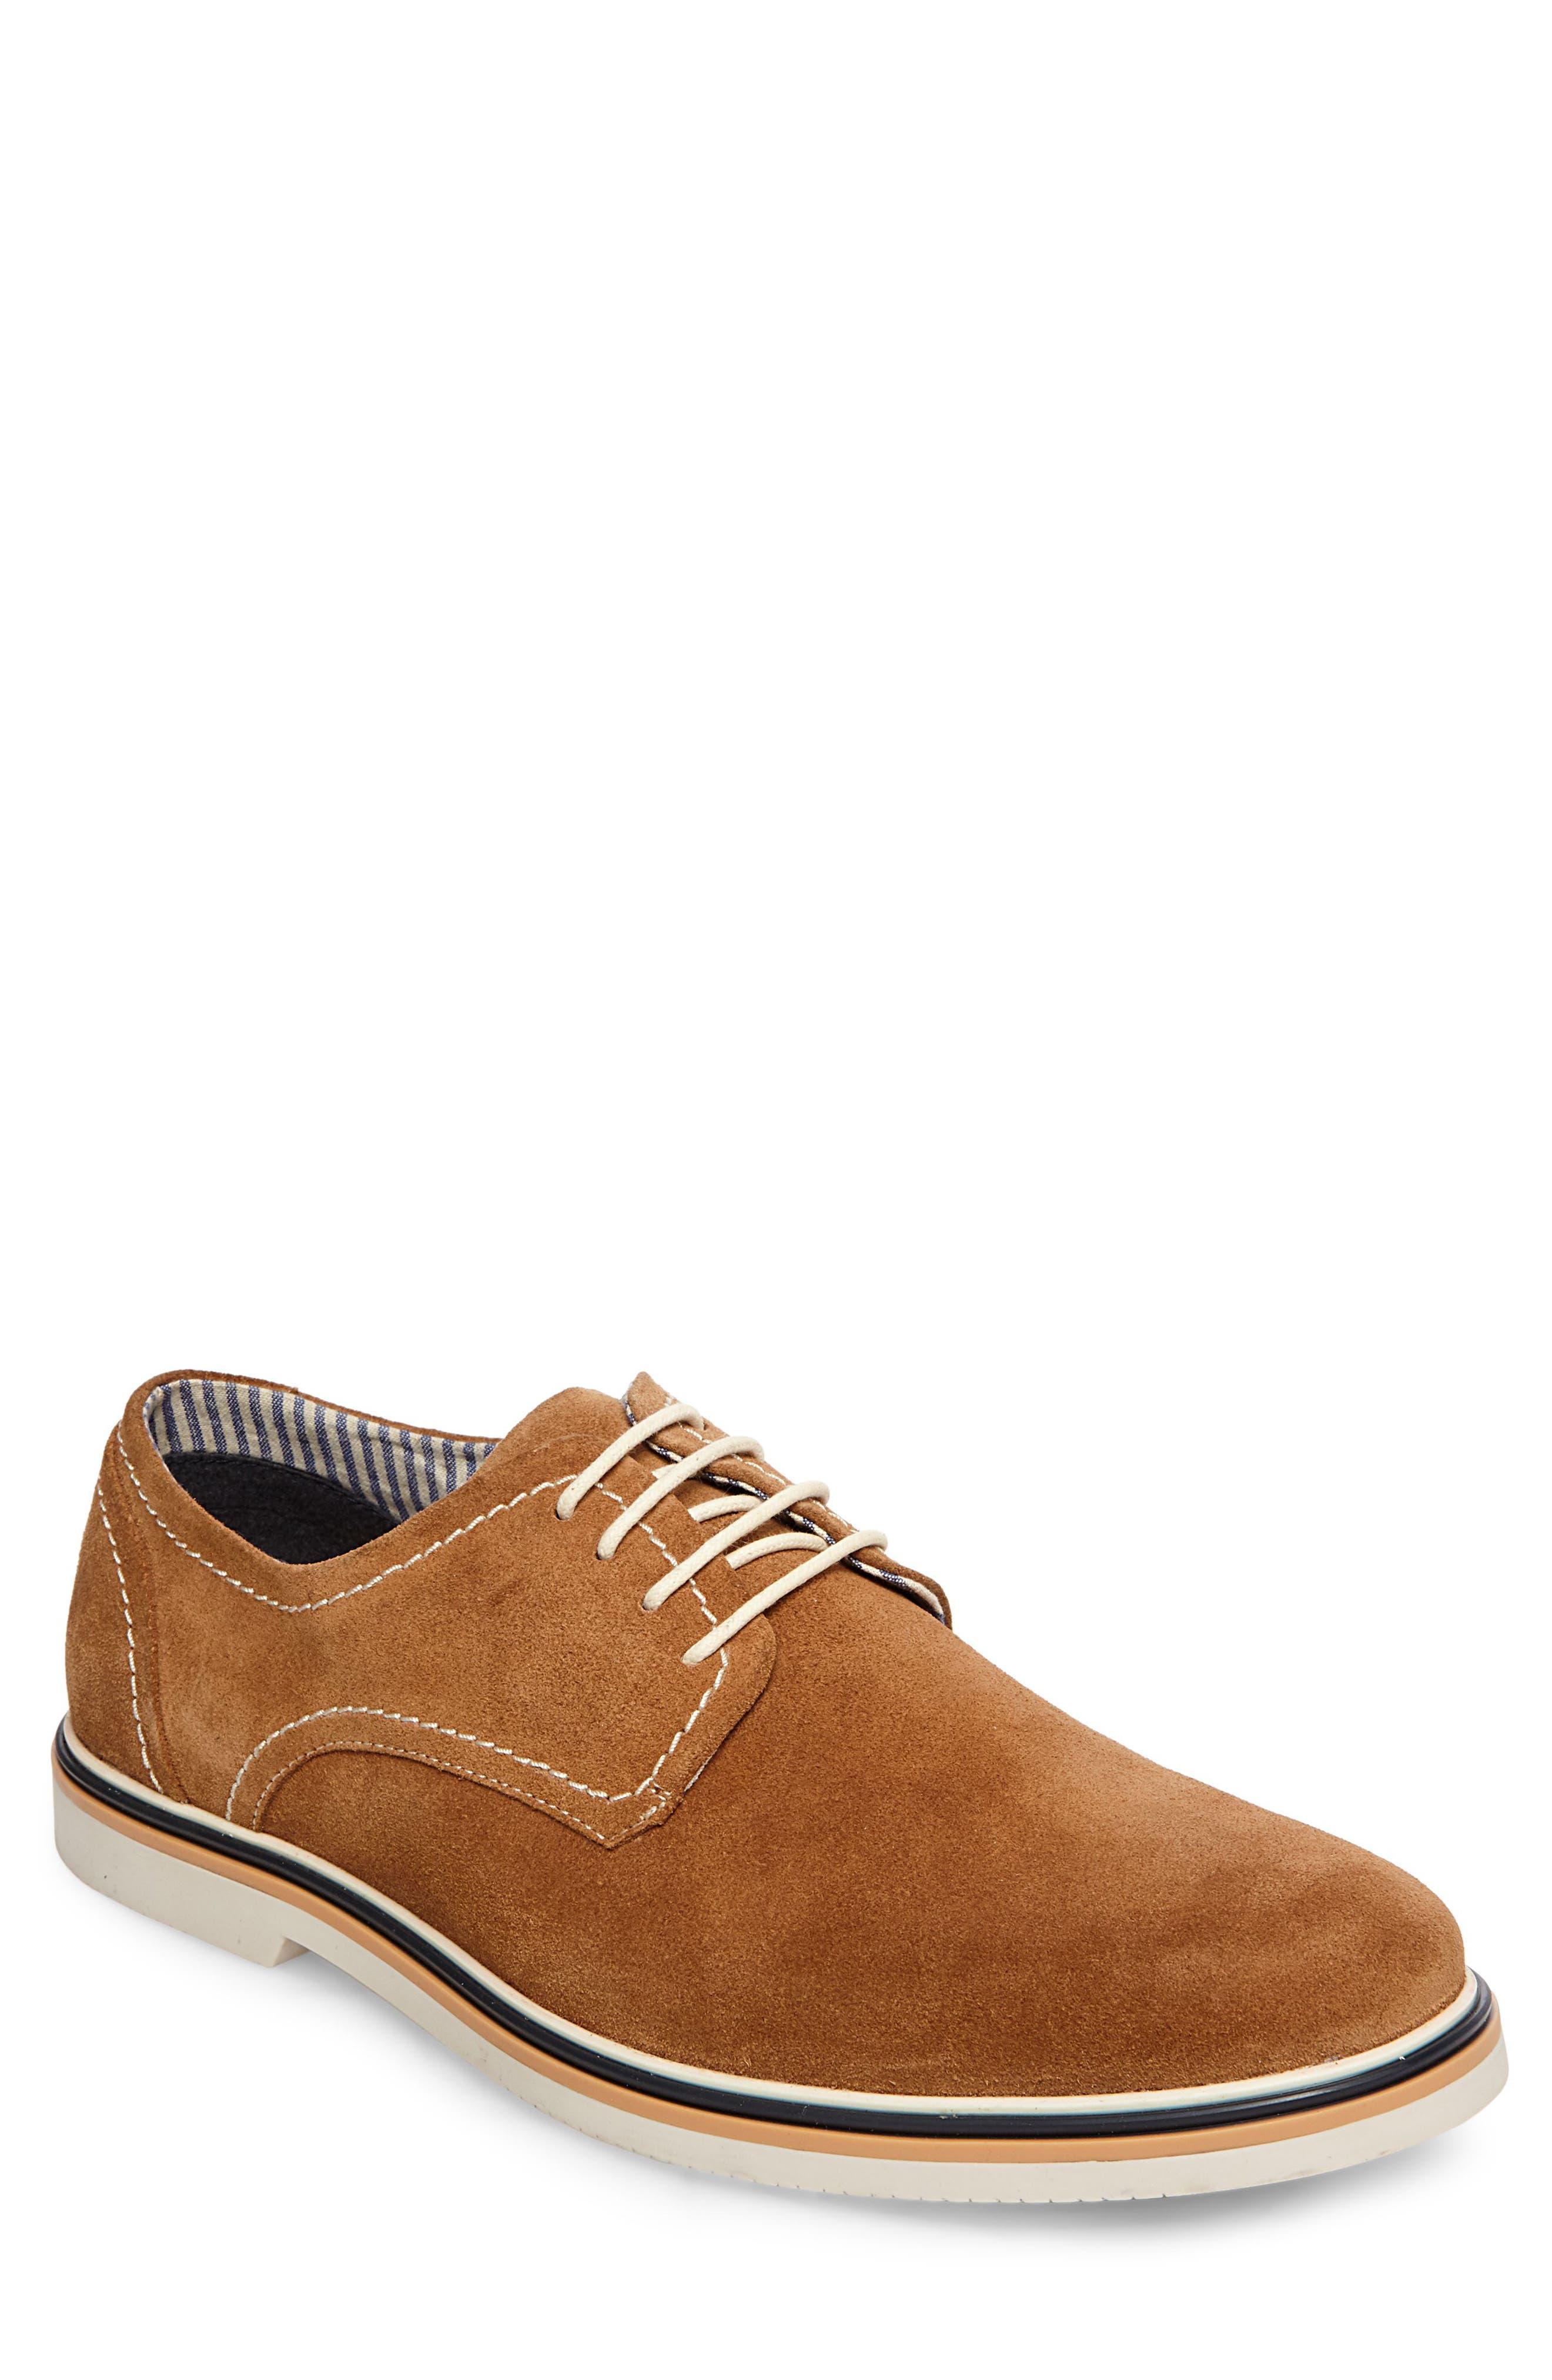 Frick Buck Shoe,                         Main,                         color, TAN SUEDE